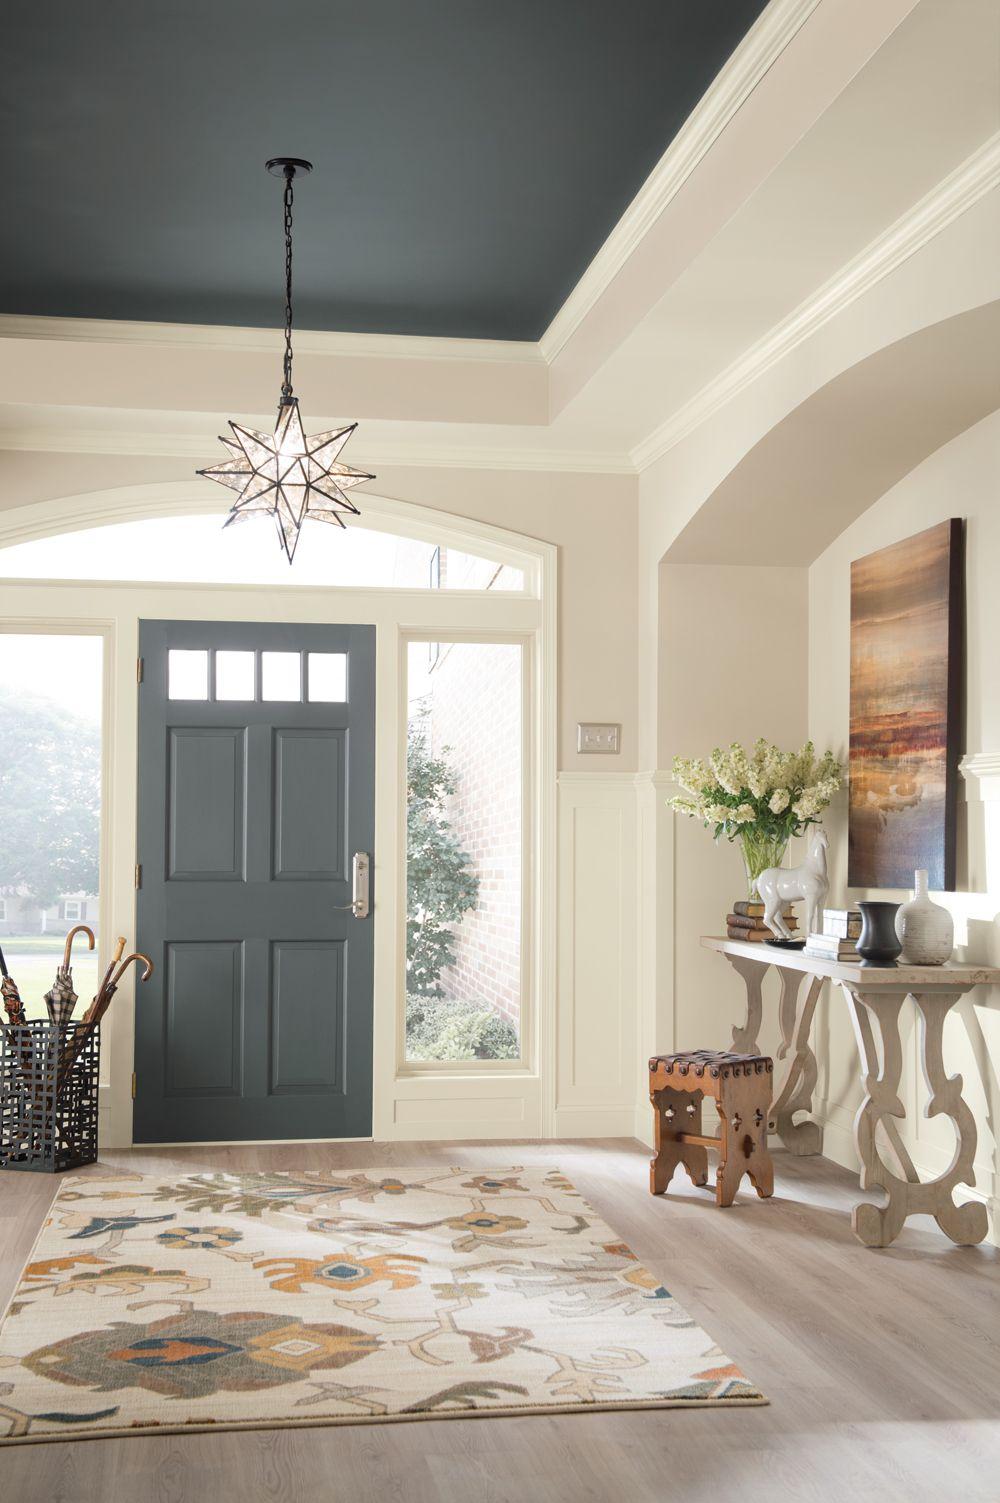 Foyer Wall Paint Ideas : Colorforecast nouvnarr.jpg 1000×1503 entryway pinterest ceilings